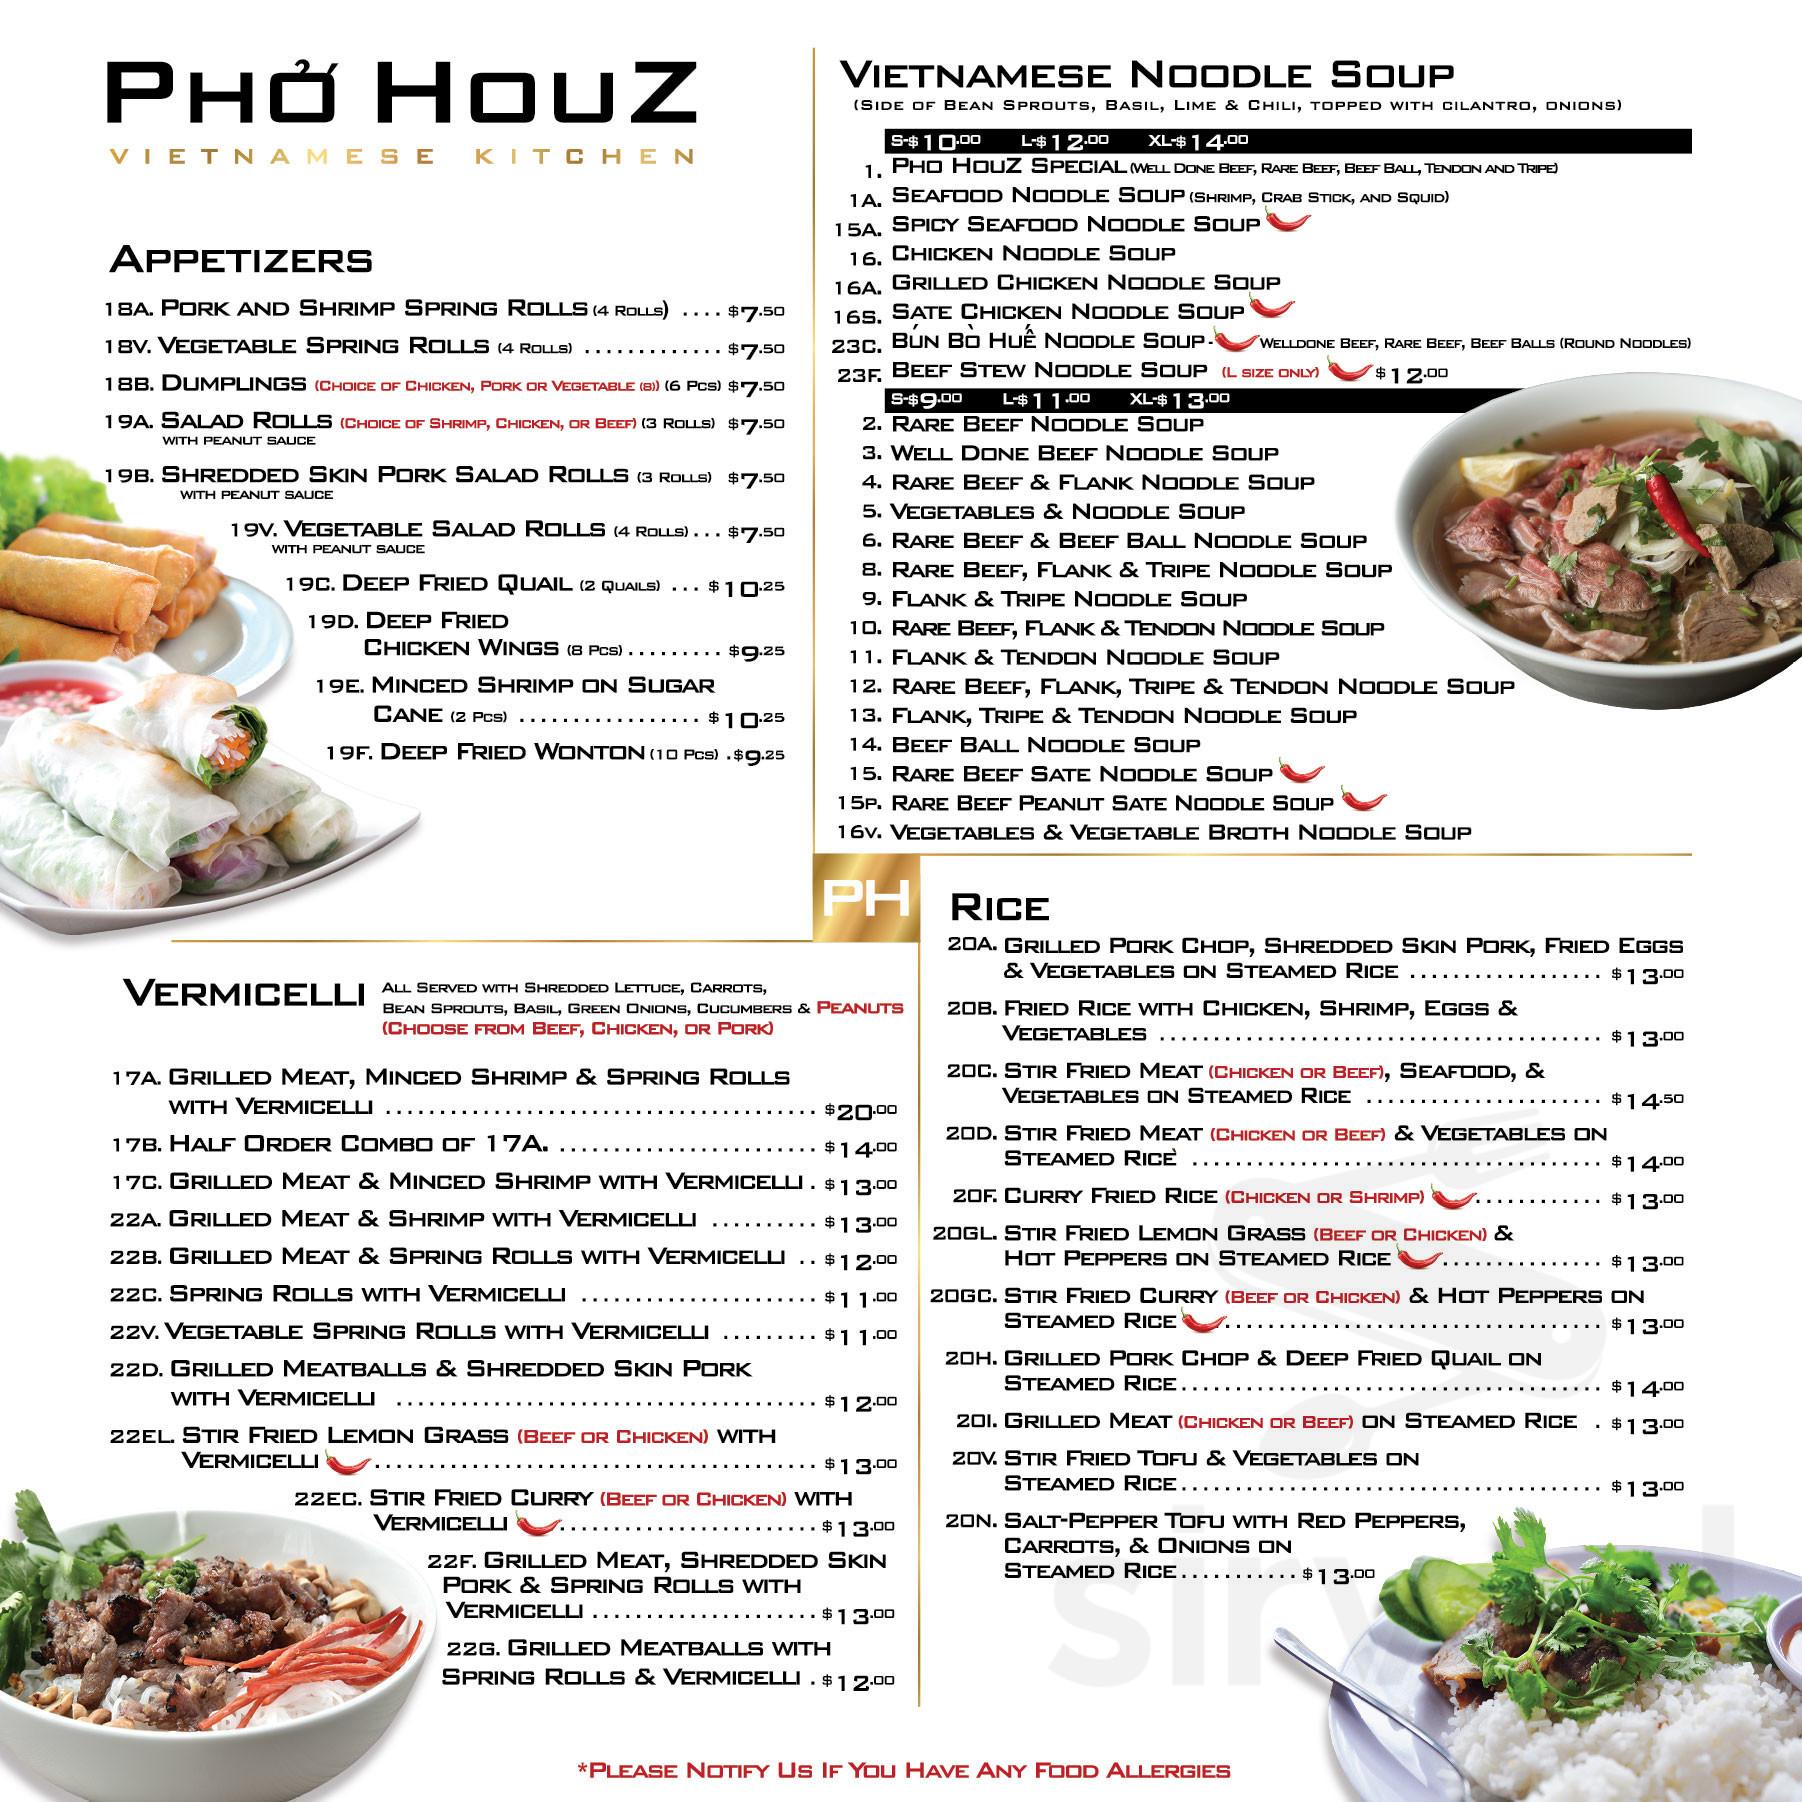 Menu For Pho Houz Vietnamese Kitchen In Calgary Alberta